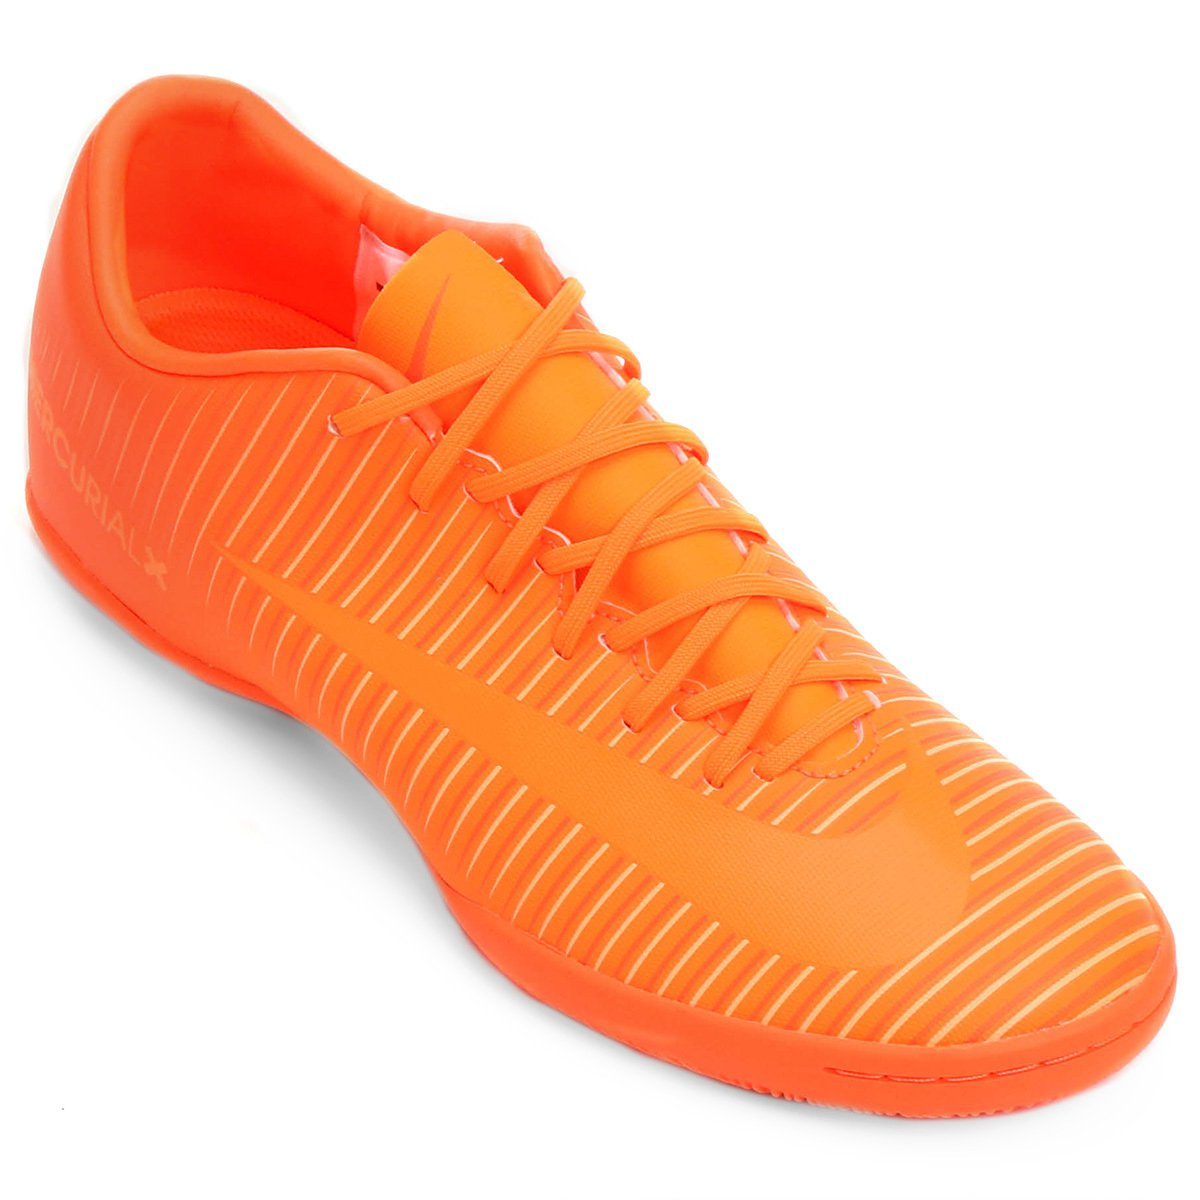 edf17add15 Chuteira Futsal Nike Mercurial Victory 6 IC - Compre Agora